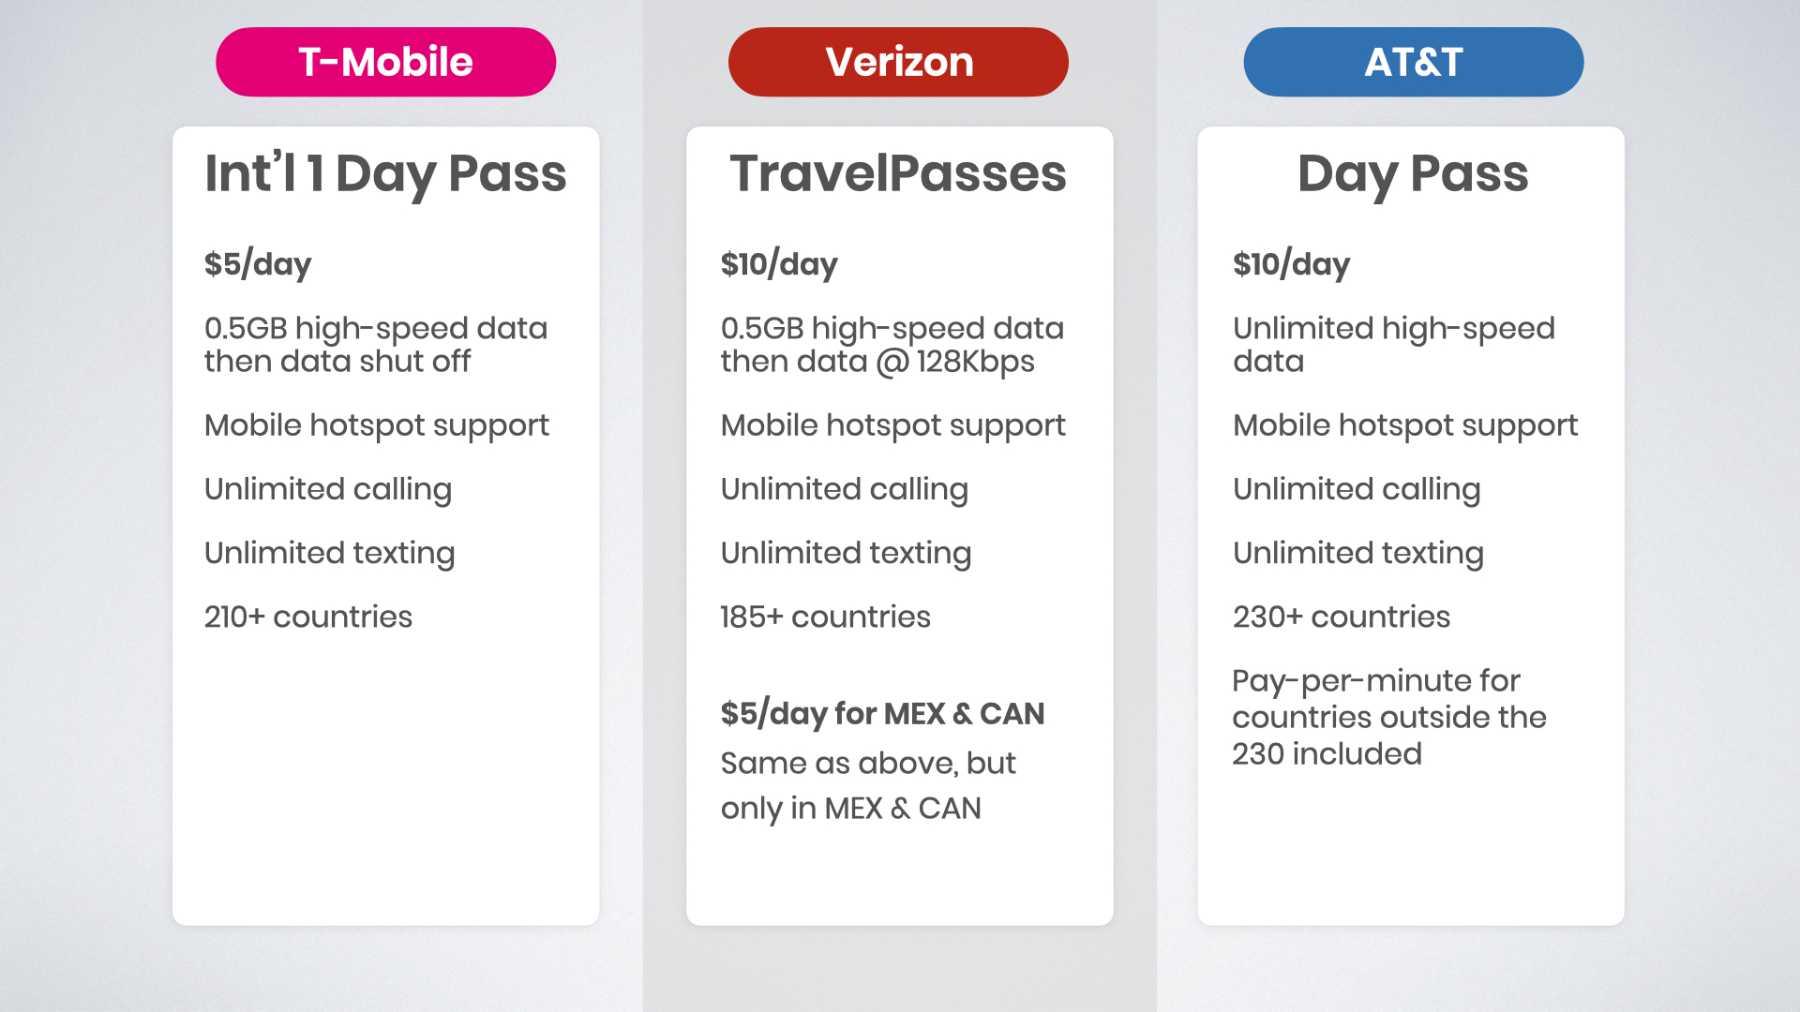 T-Mobile vs Verizon vs AT&T international day pass comparison